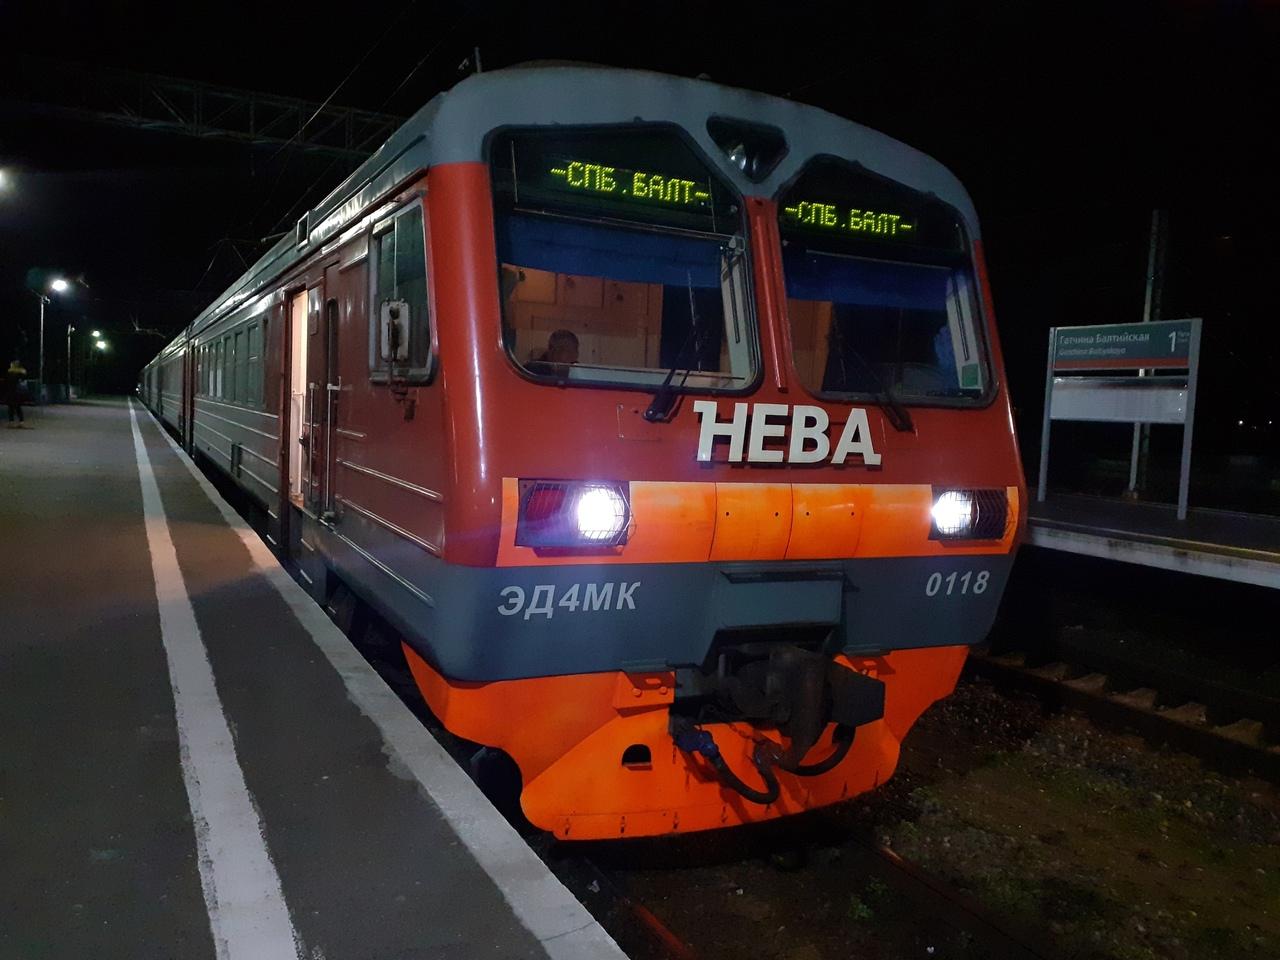 Электричка ЭД4МК-0118. Поезд с детским вагоном